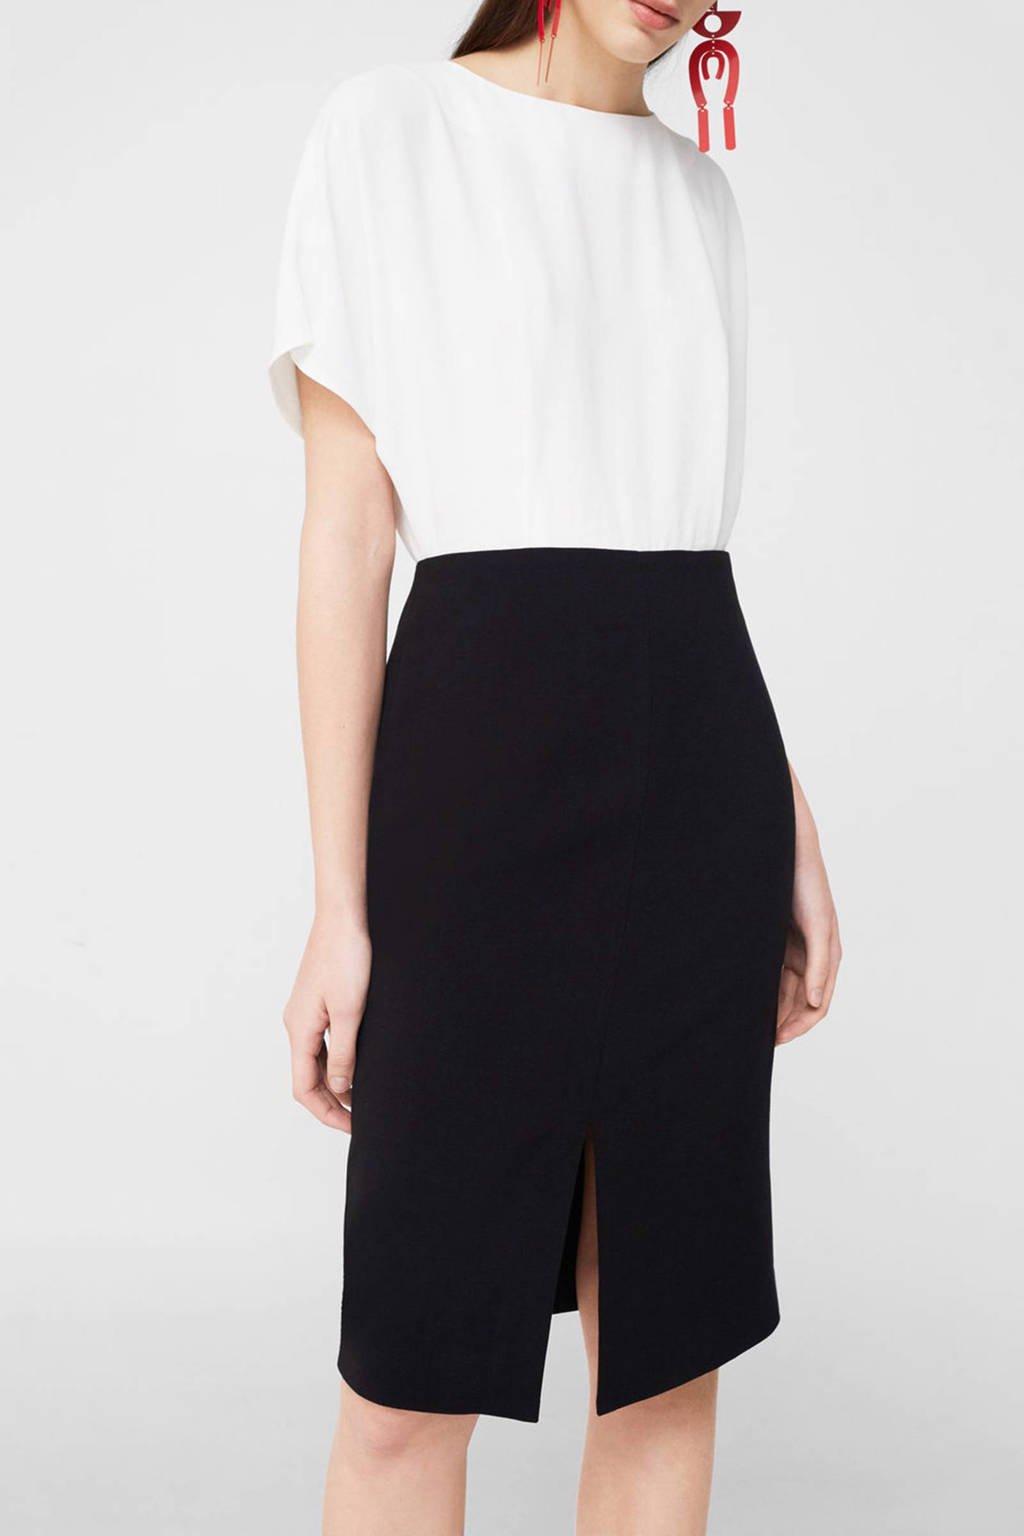 Mango jurk, Naturel wit/zwart